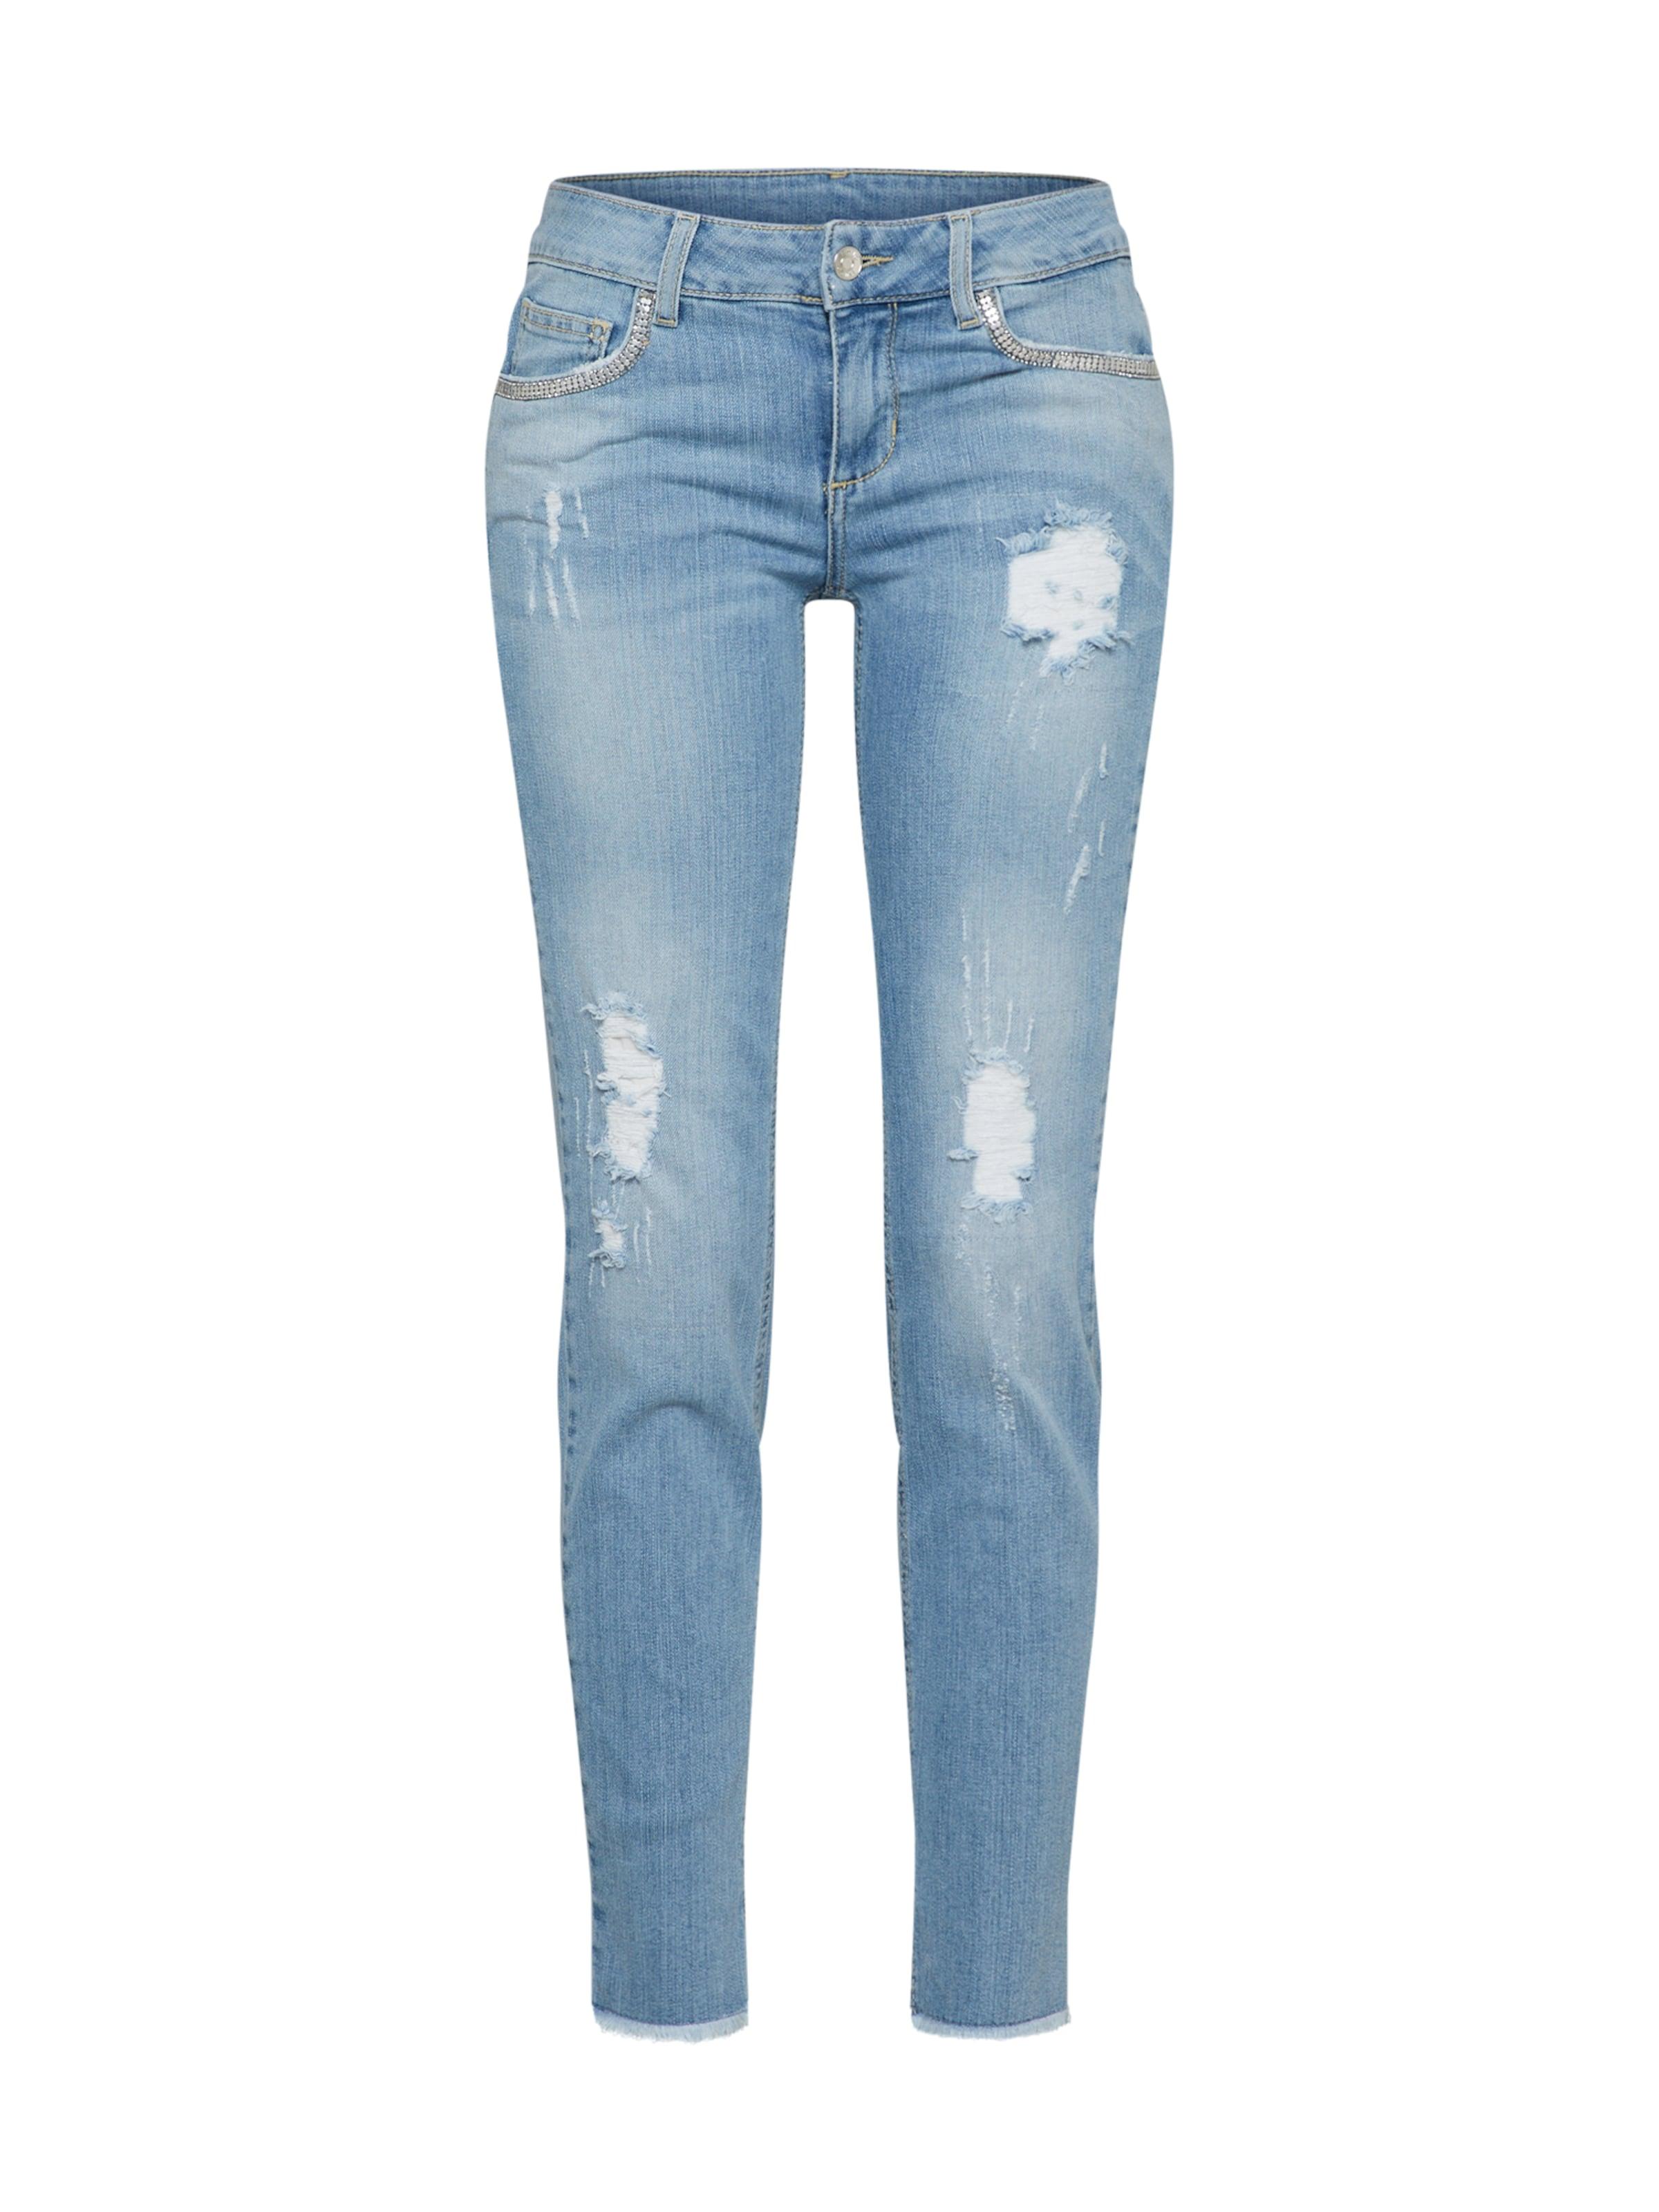 Jo Liu Blue Denim Jeans Jeanshose In oCBedx